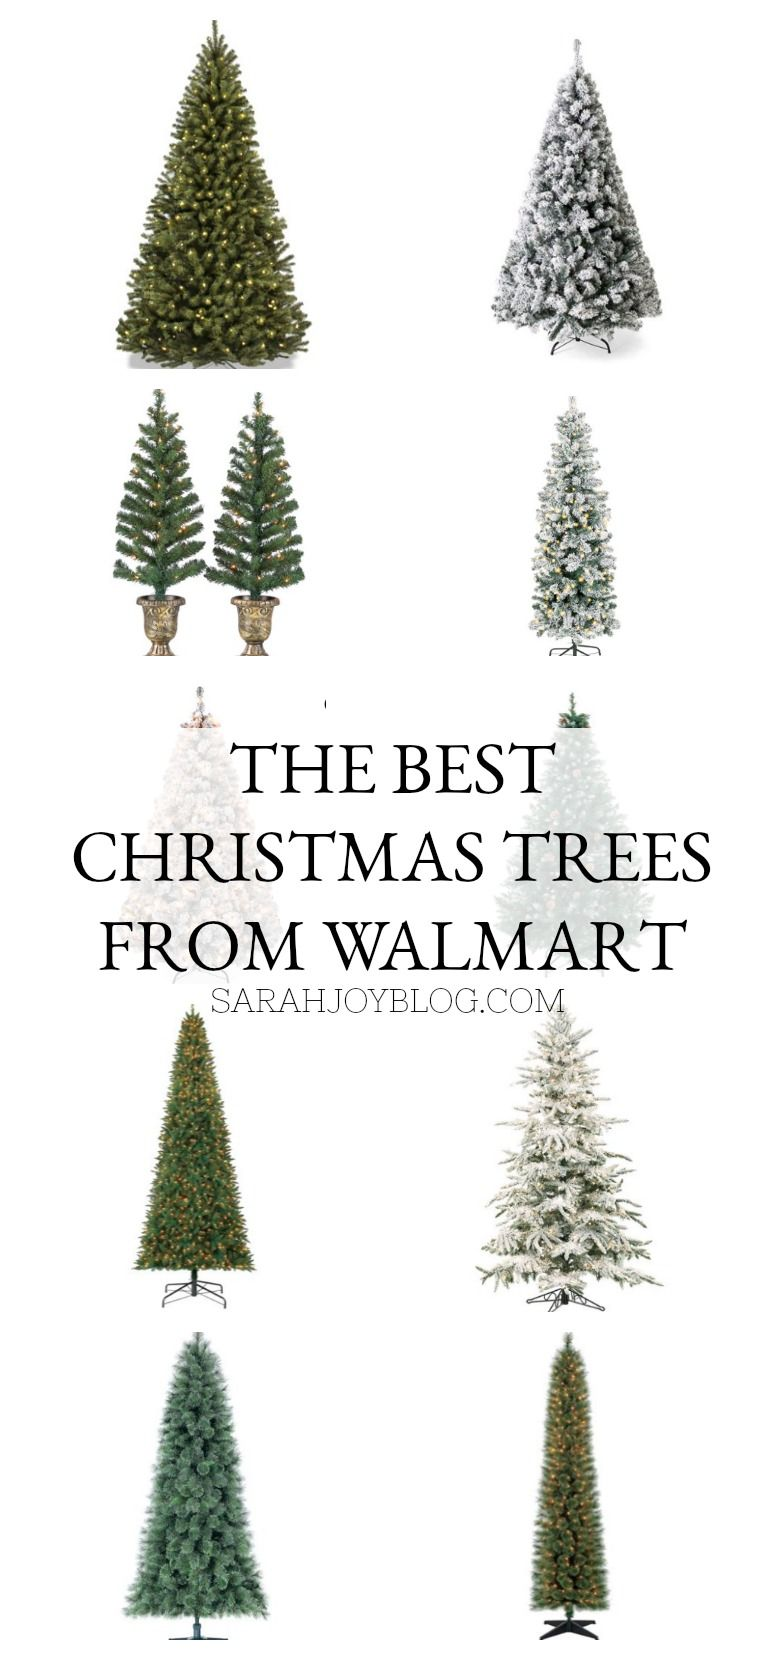 Farmhouse Style Christmas Decor From Walmart The Top Rated Christmas Trees Fro Walmart Christmas Decorations Farmhouse Style Christmas Walmart Christmas Trees